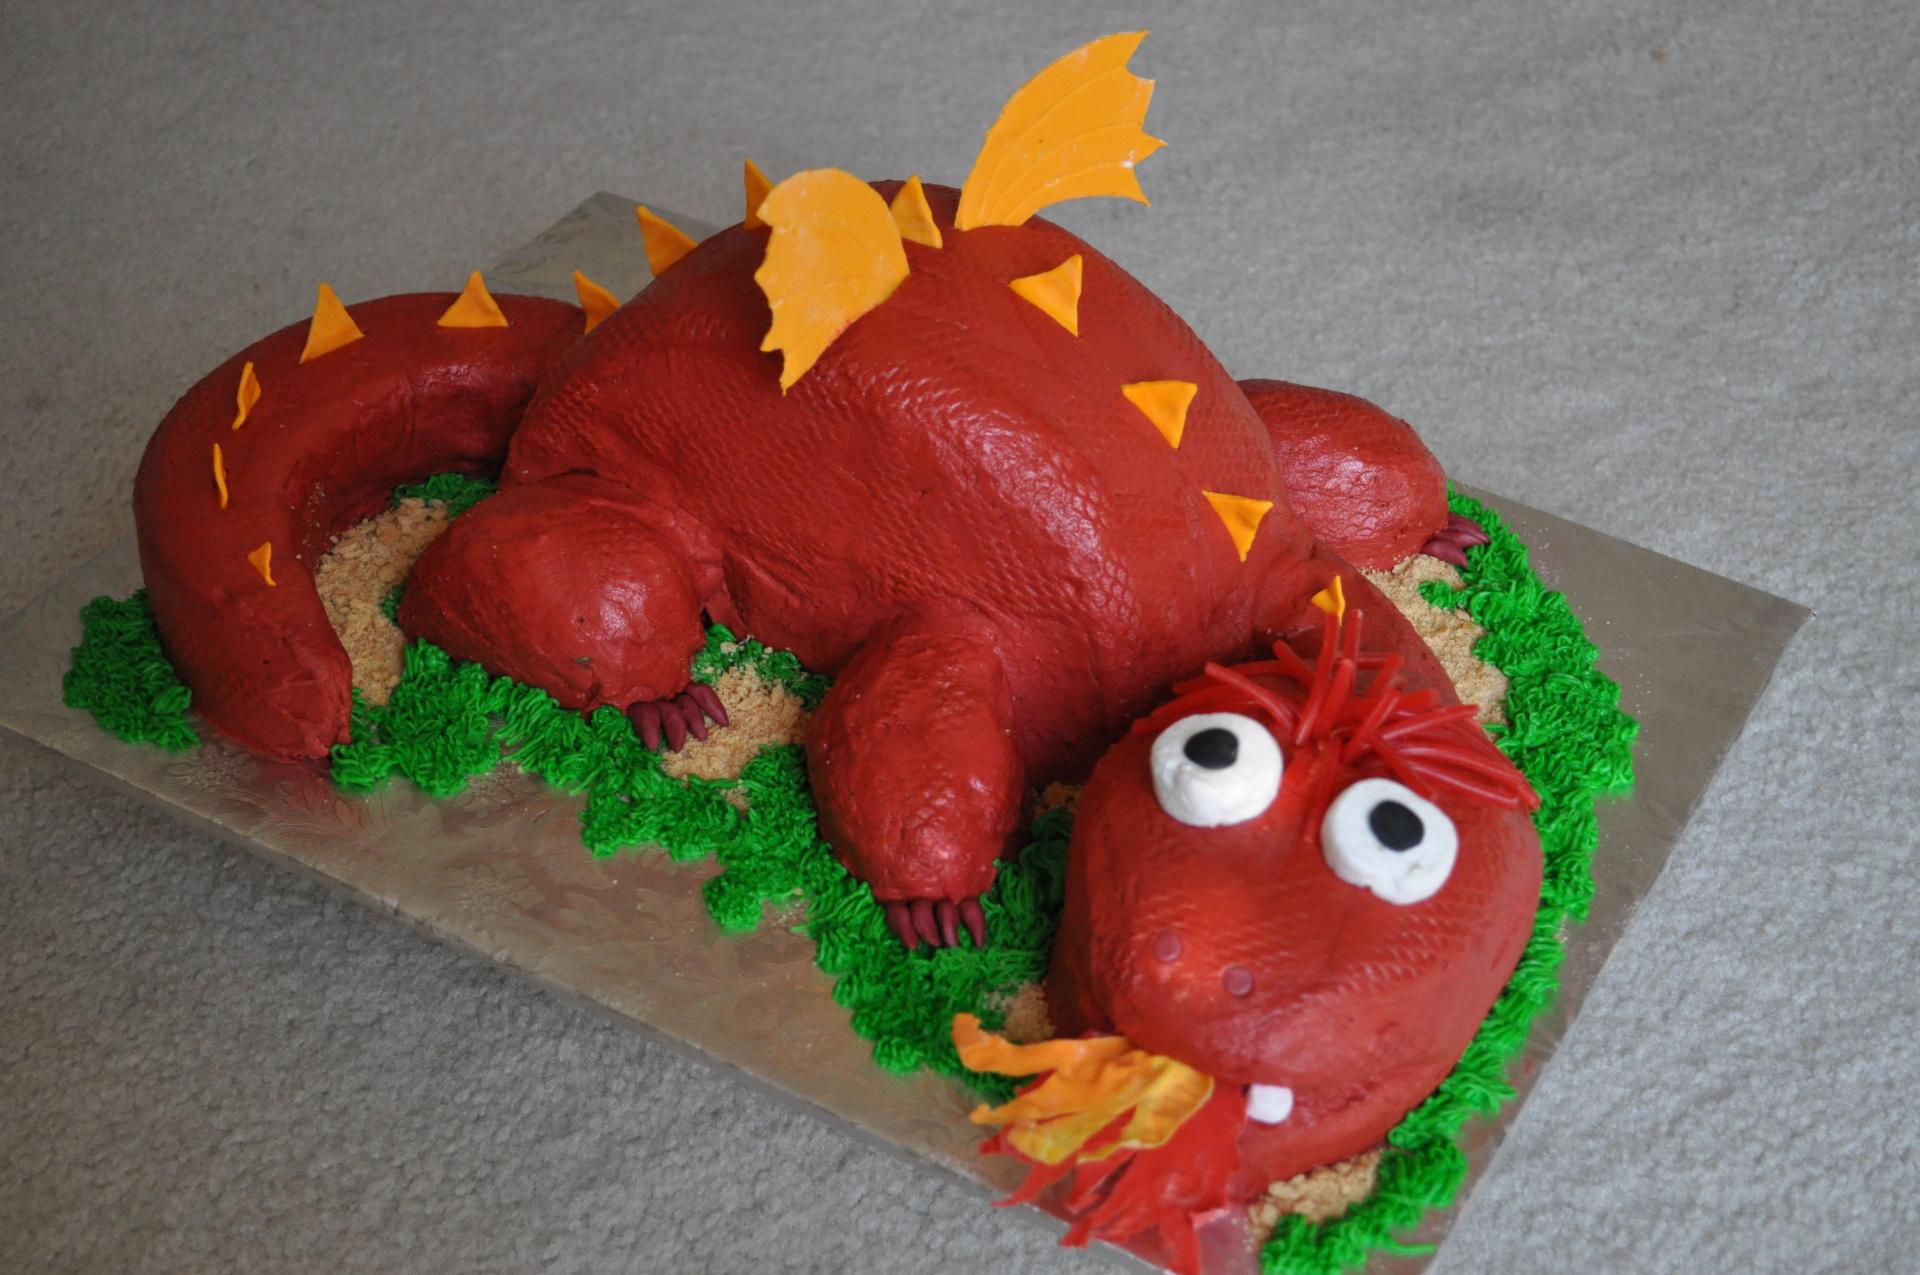 Carved Dragon cake